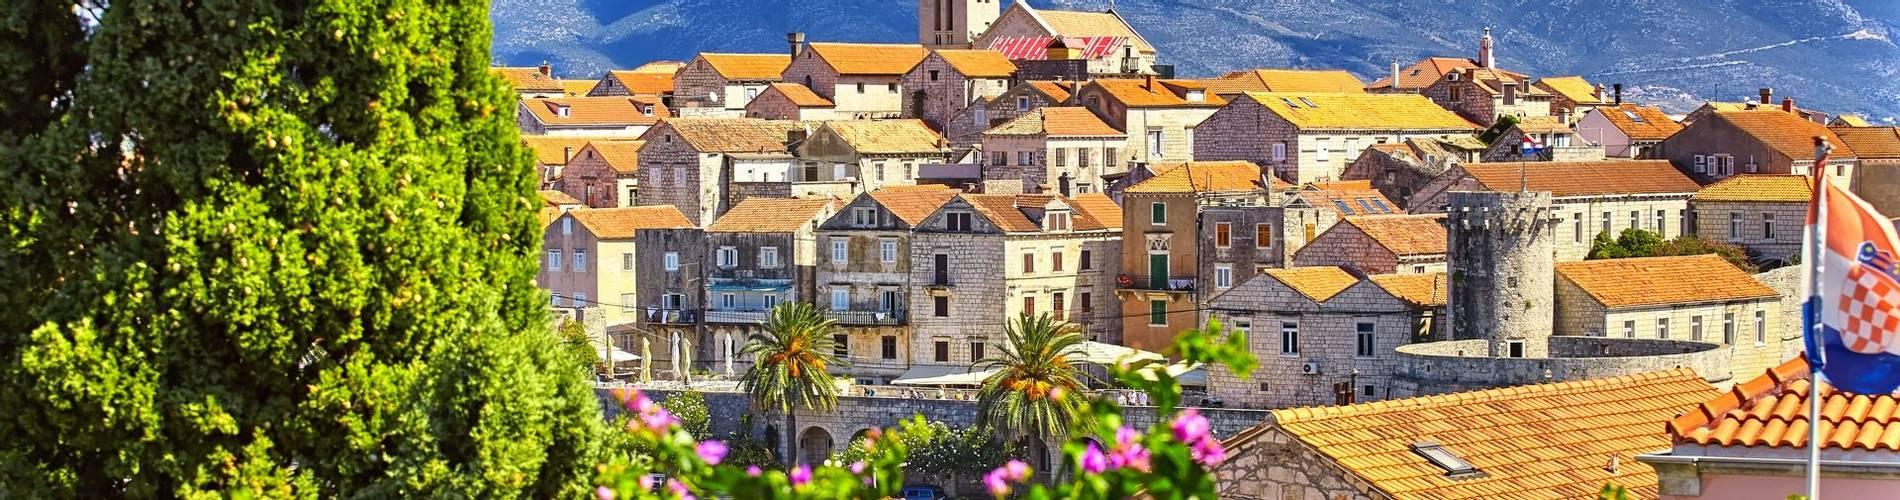 Dalmatia coast, Korcula town.jpg